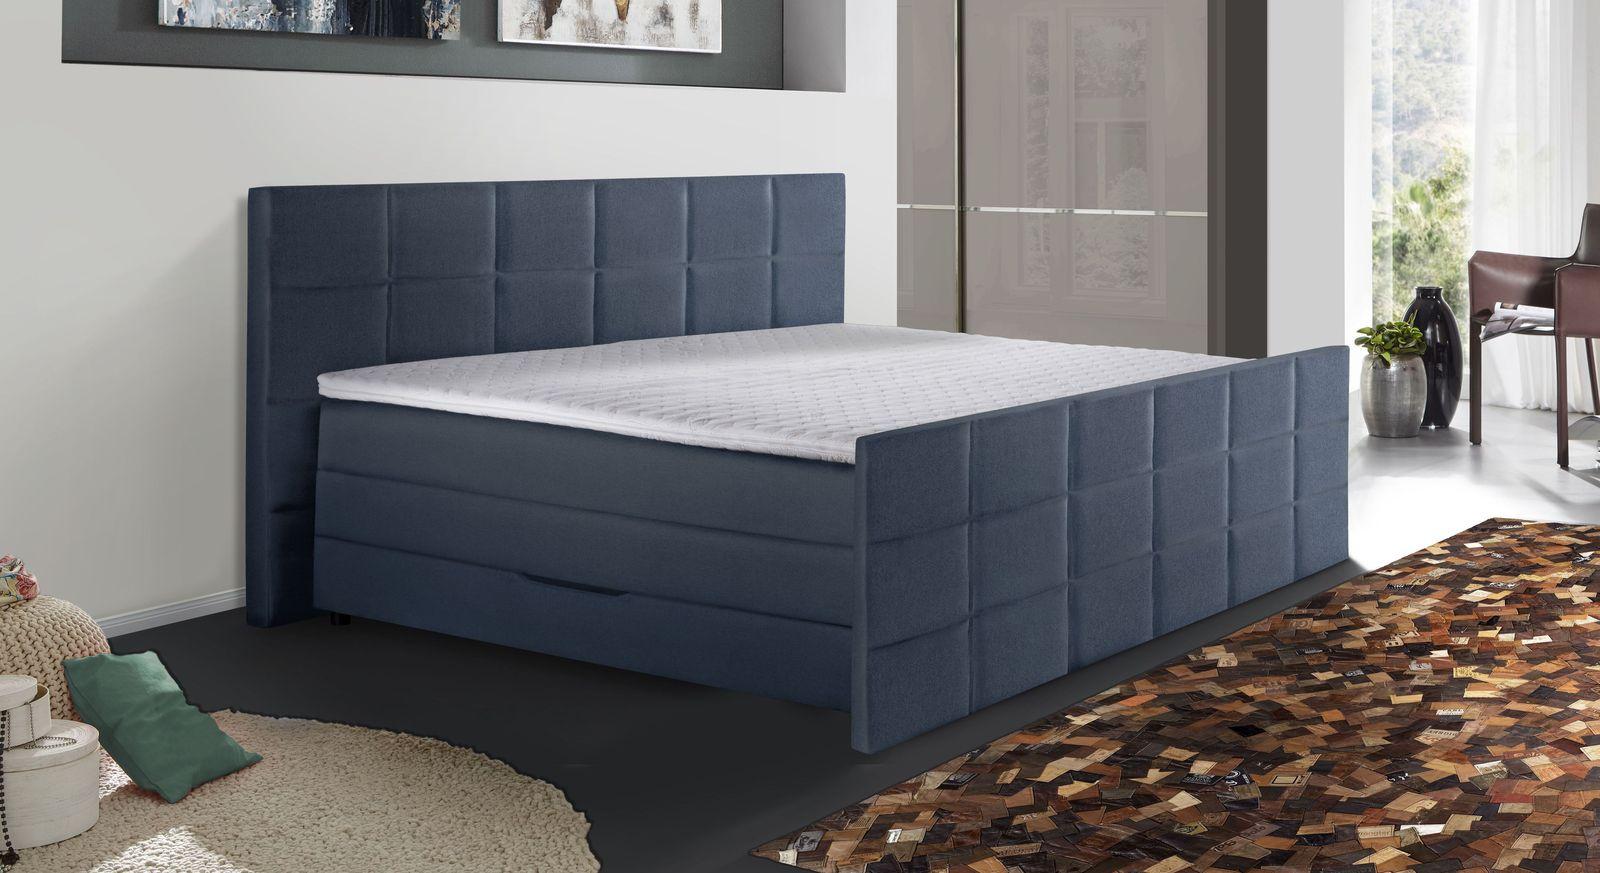 Bettkasten-Boxspringbett Cordilla mit blauem Stoffbezug